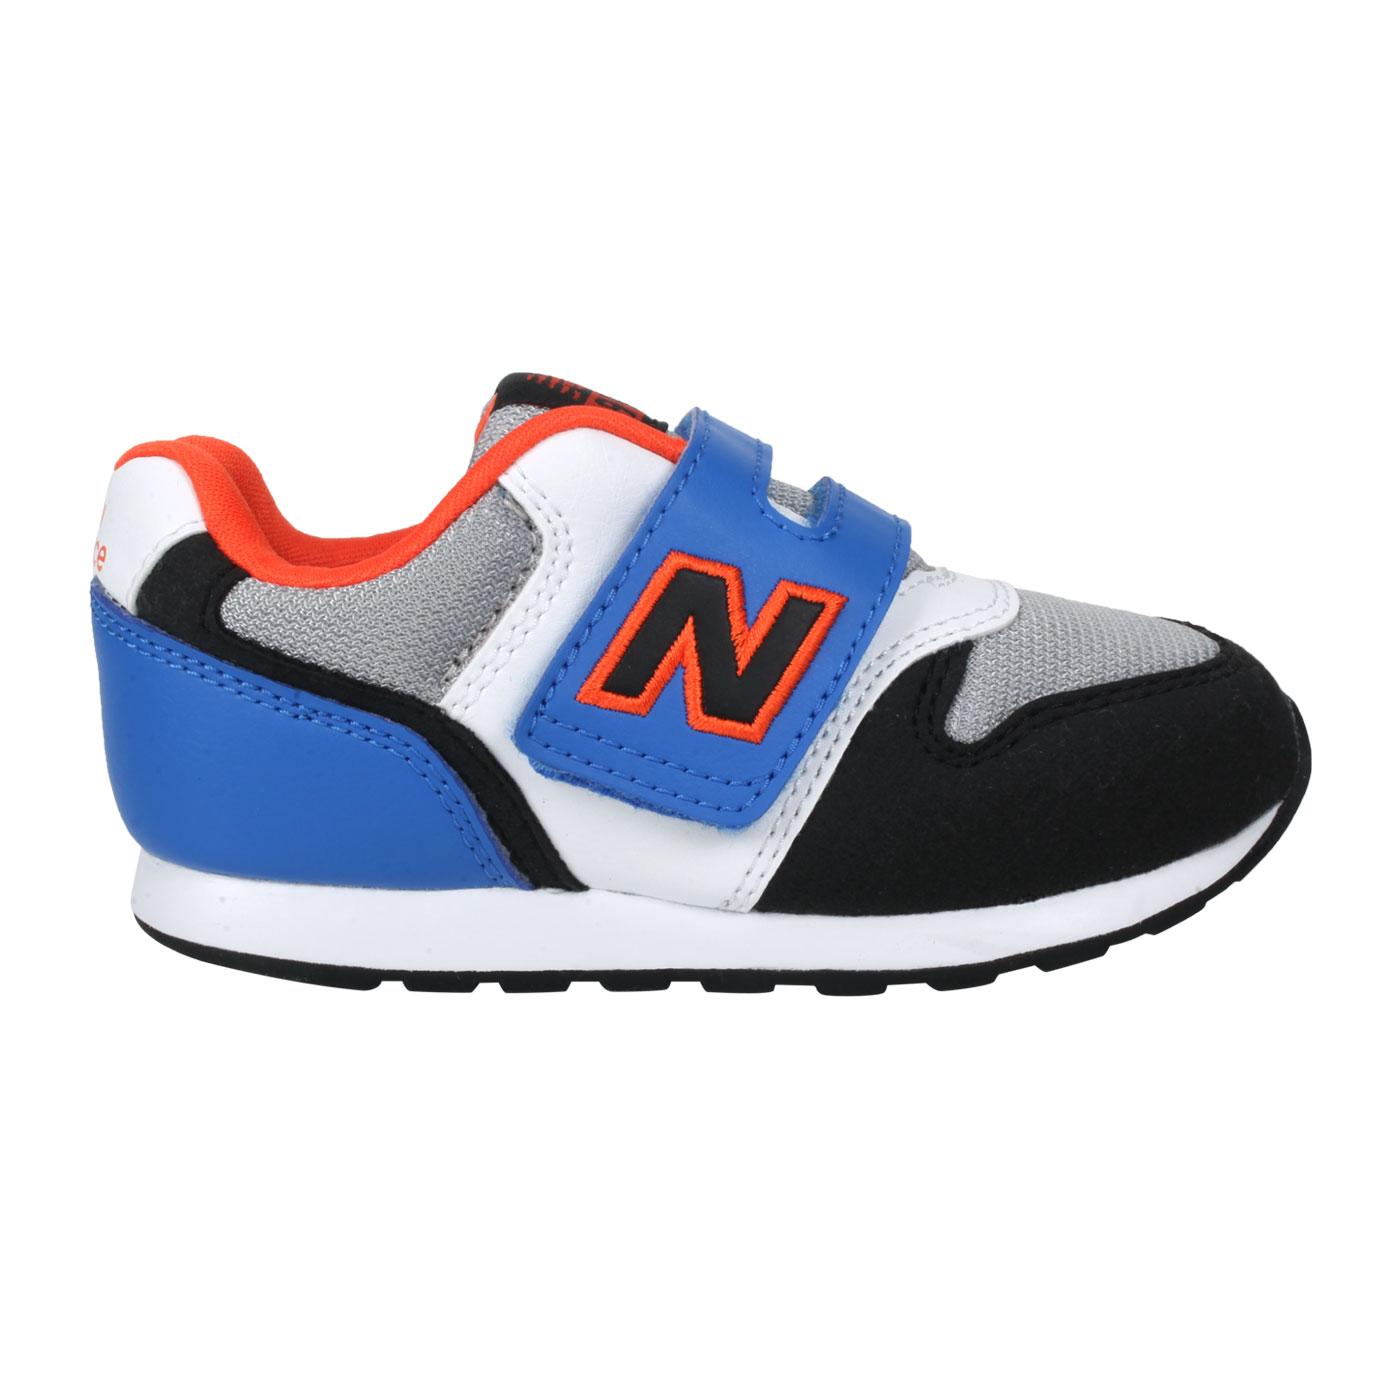 NEW BALANCE 小童休閒運動鞋-WIDE IZ996MBO